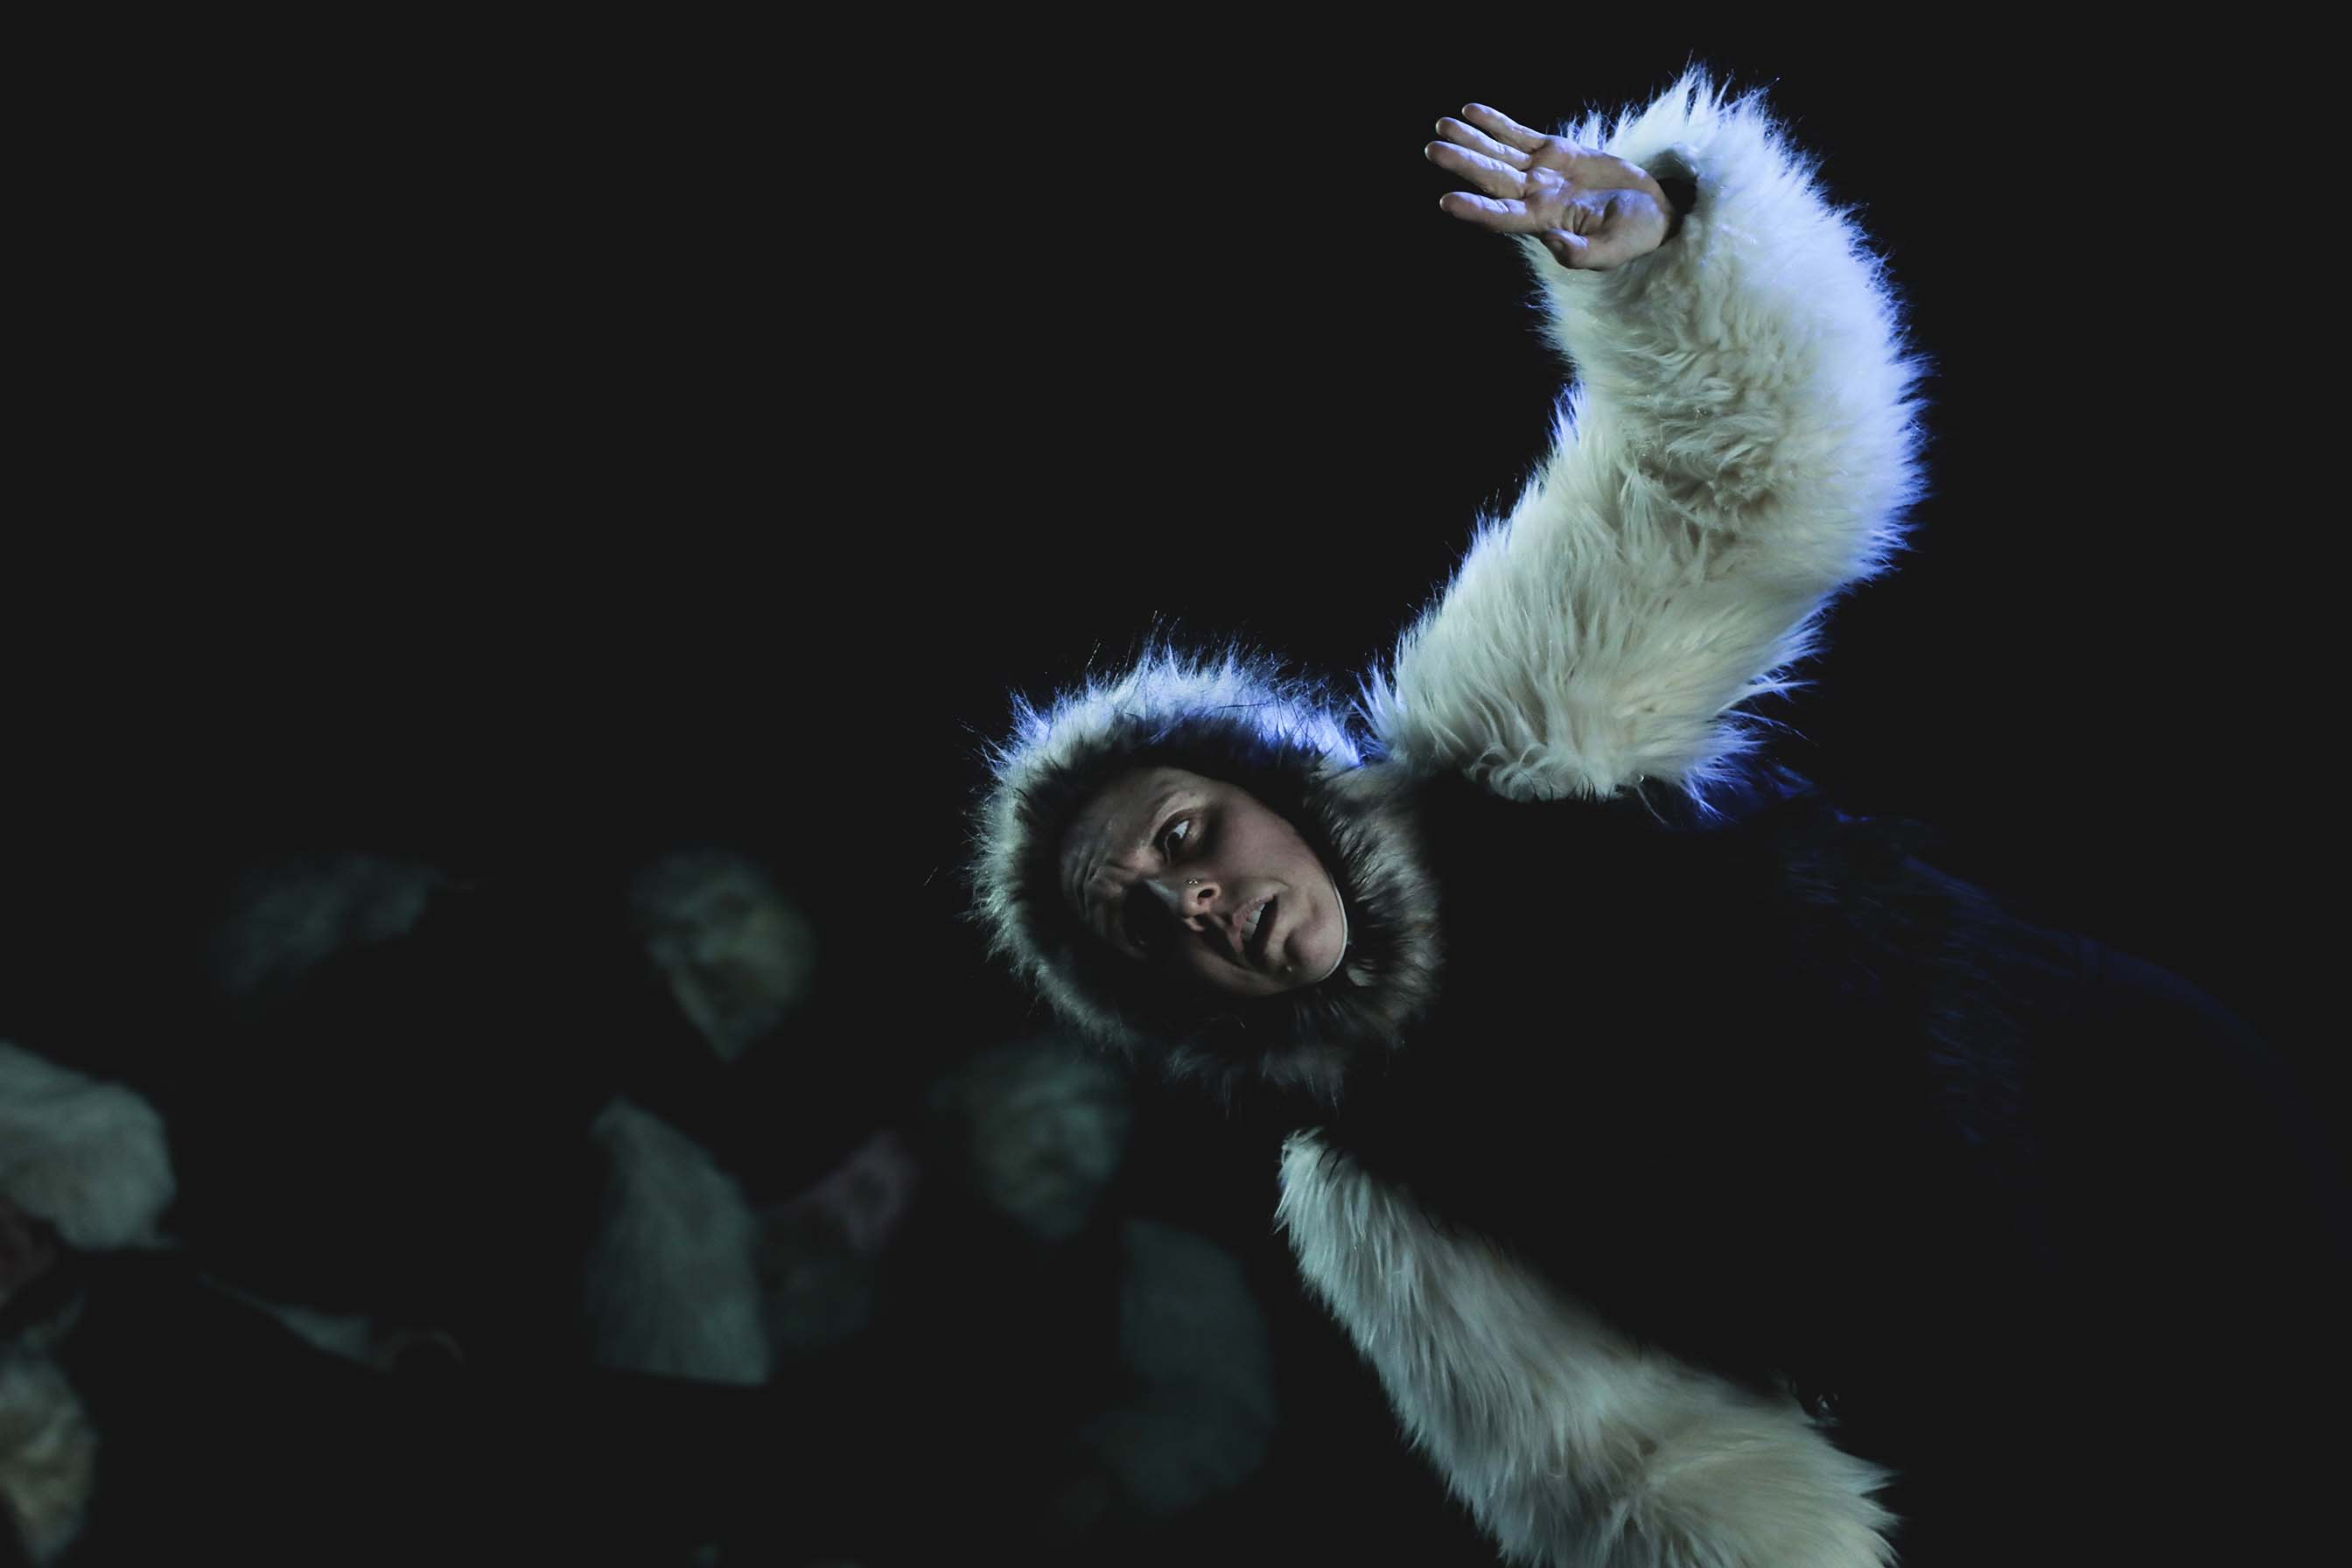 person wearing a white fur coat dancing